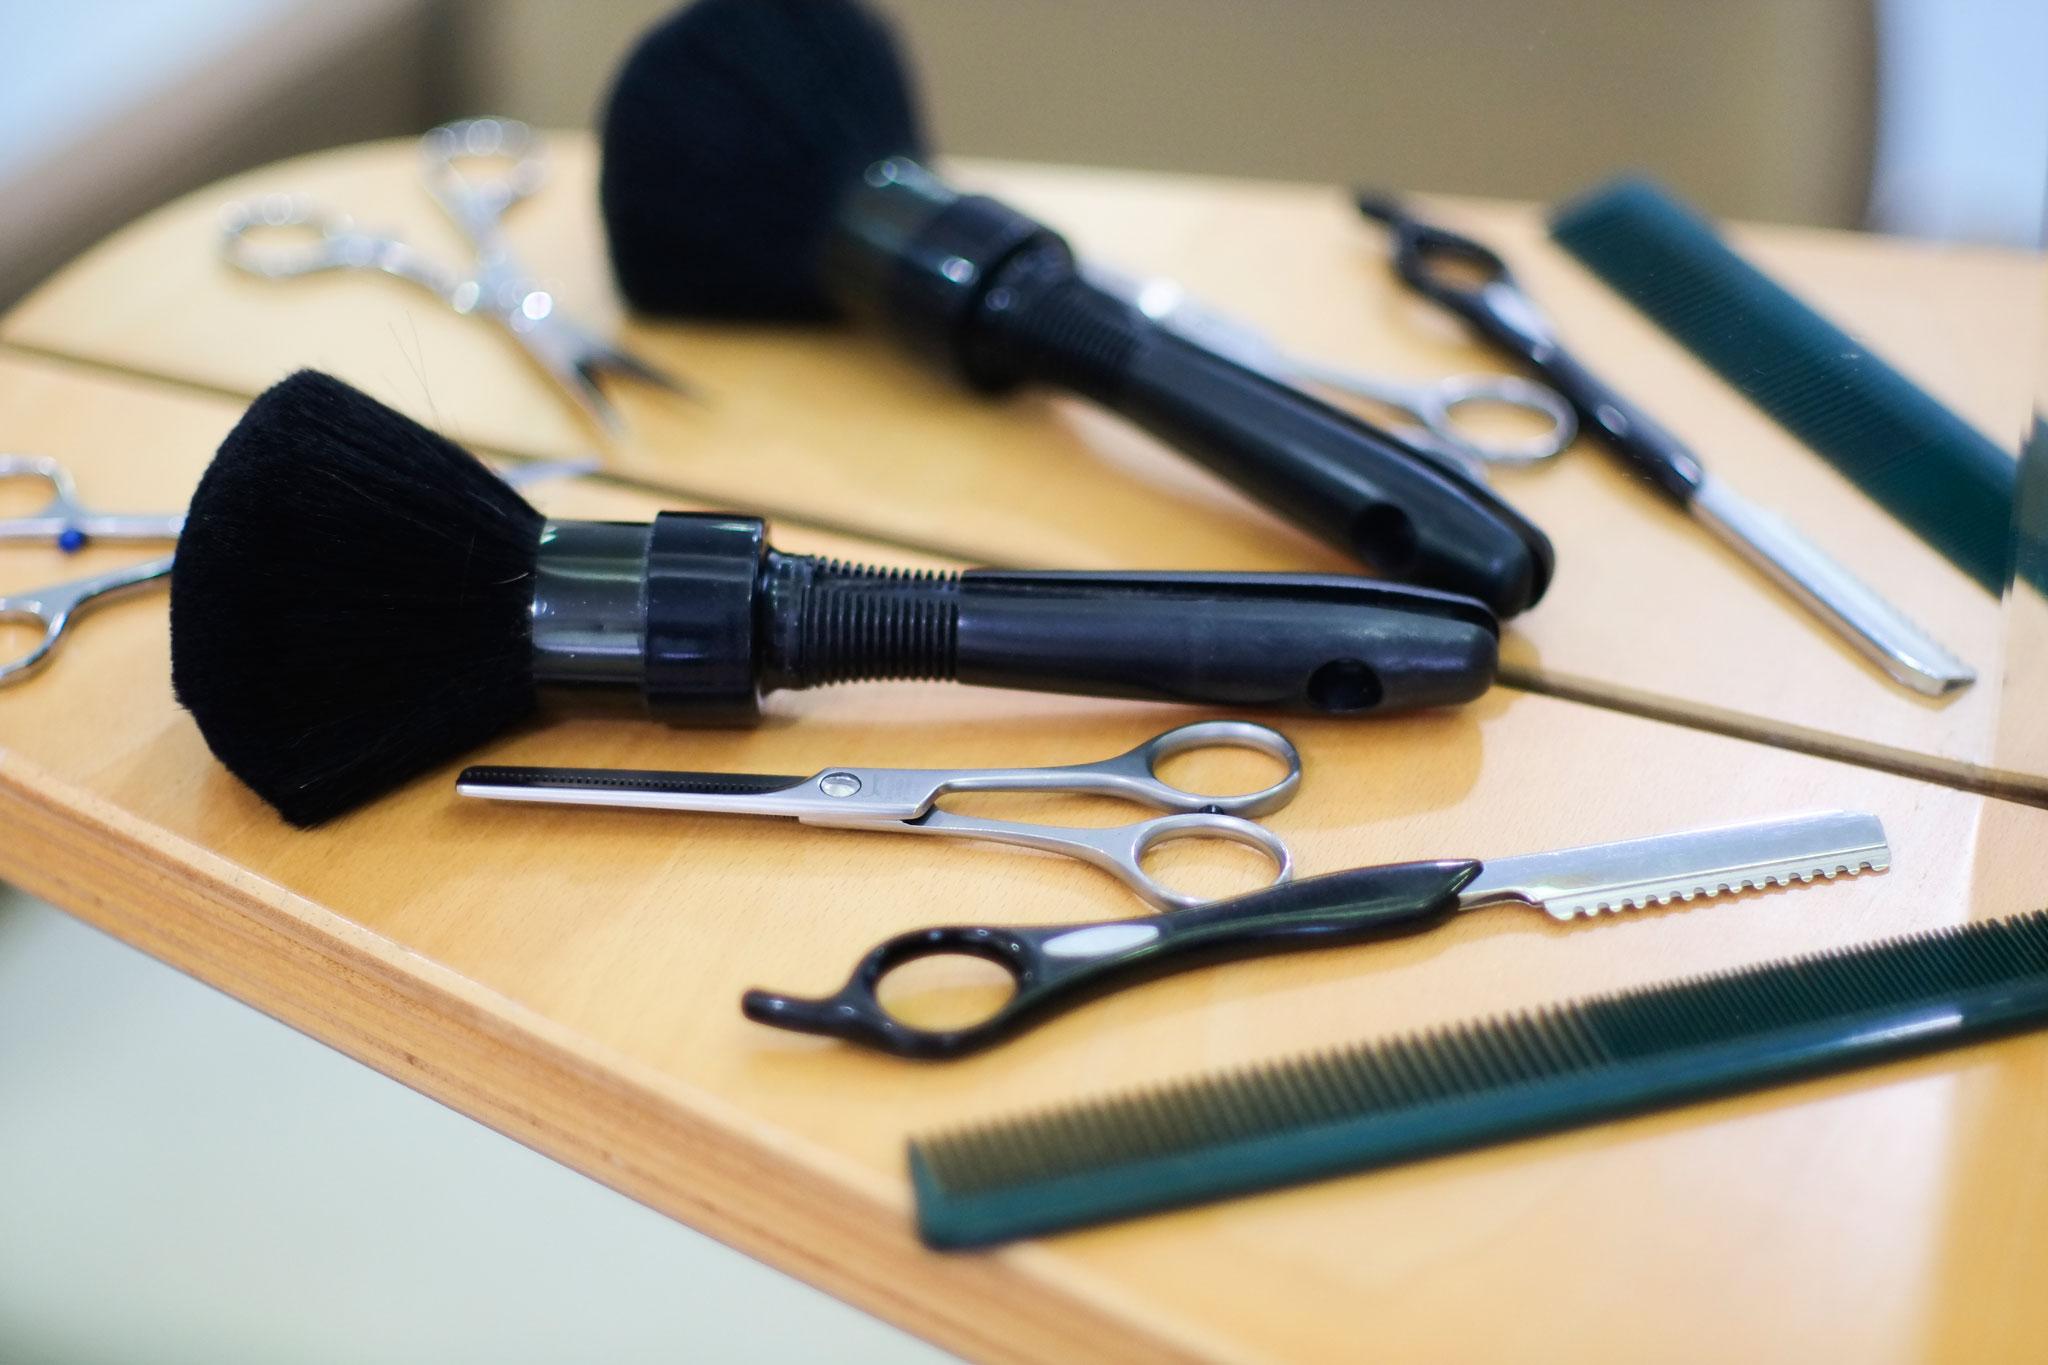 inés colomé perruqueria barberia tortosa peluquería barbería